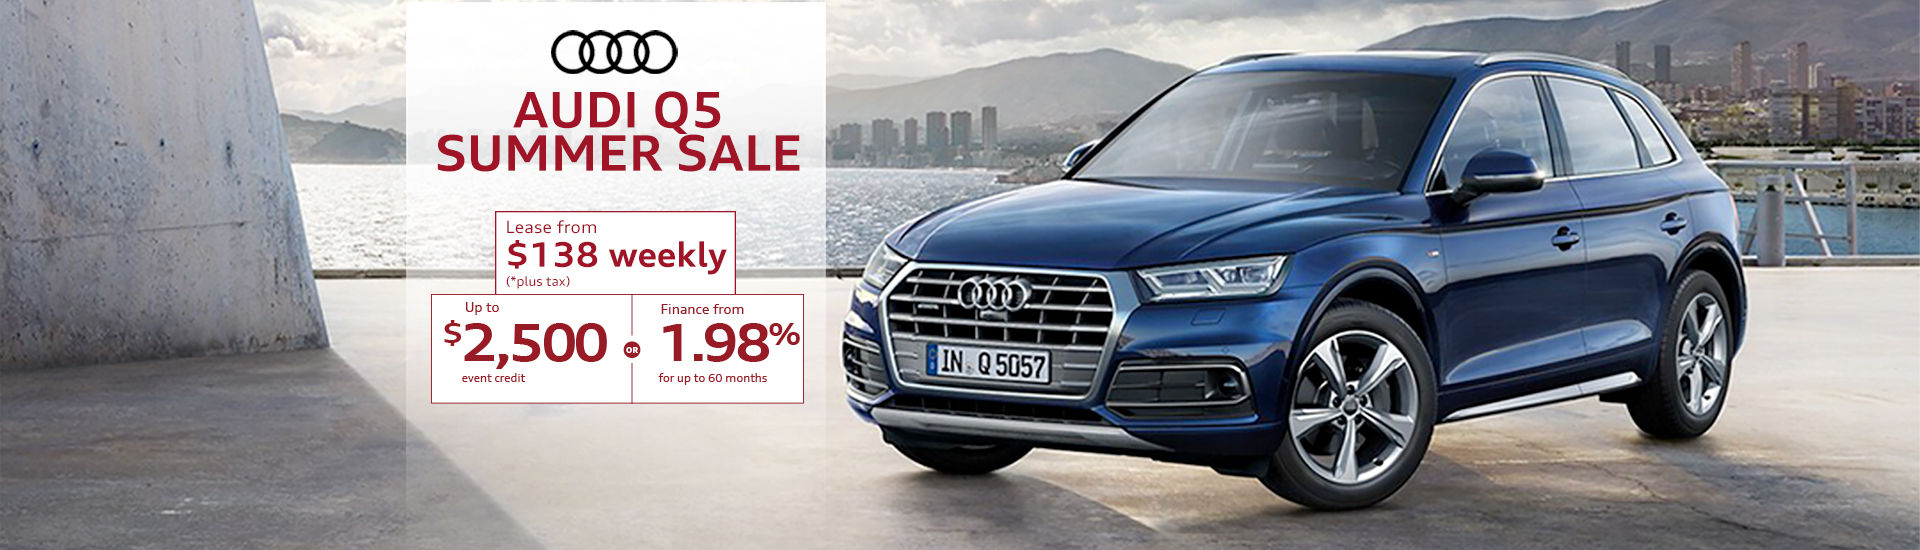 Audi Q5 Summer Sale